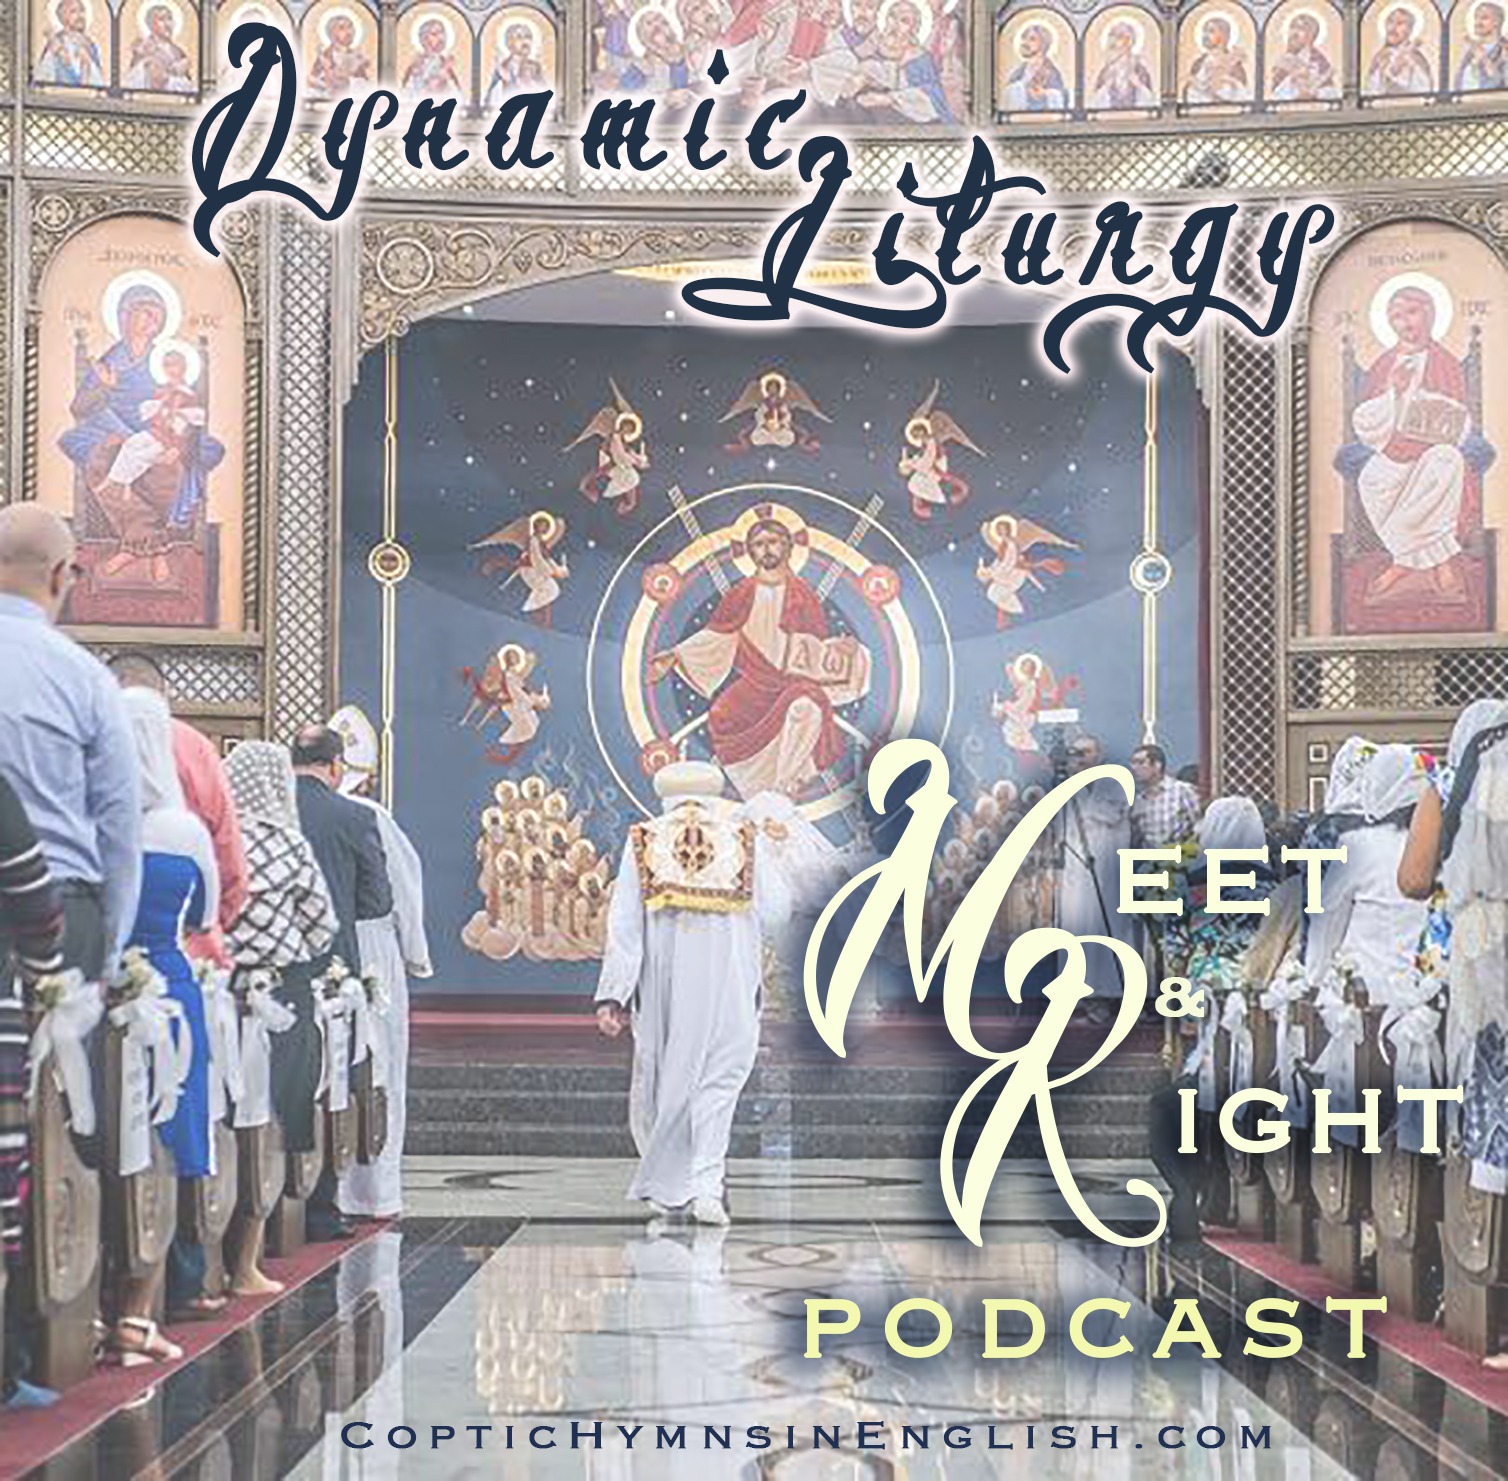 Dynamic Liturgy Ad.jpg